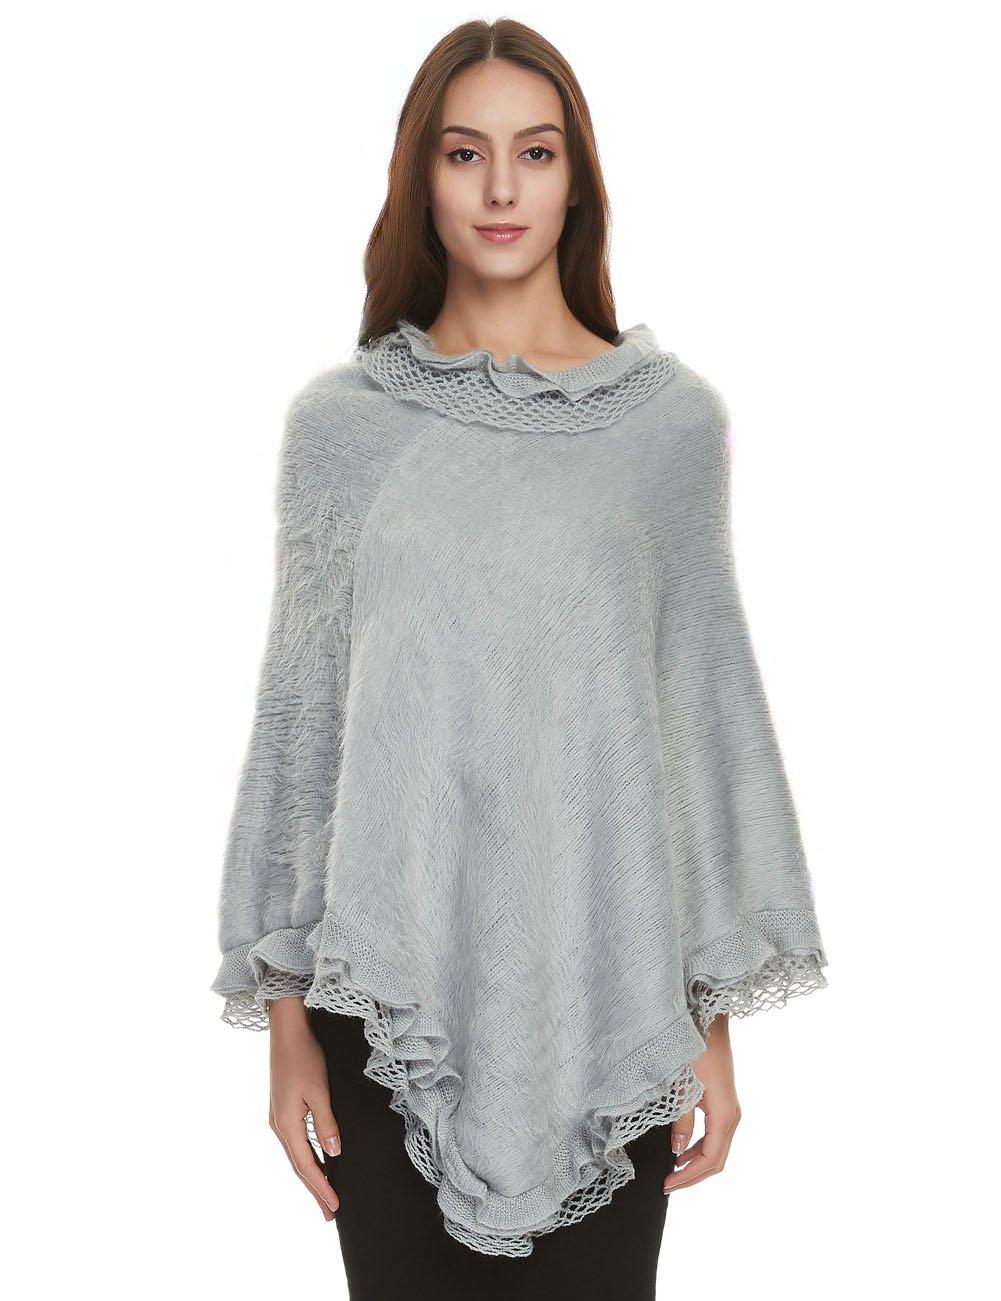 Ferand Women's Ruffle Lace Soft Poncho Sweater Warm Pullover Cape, Light Grey